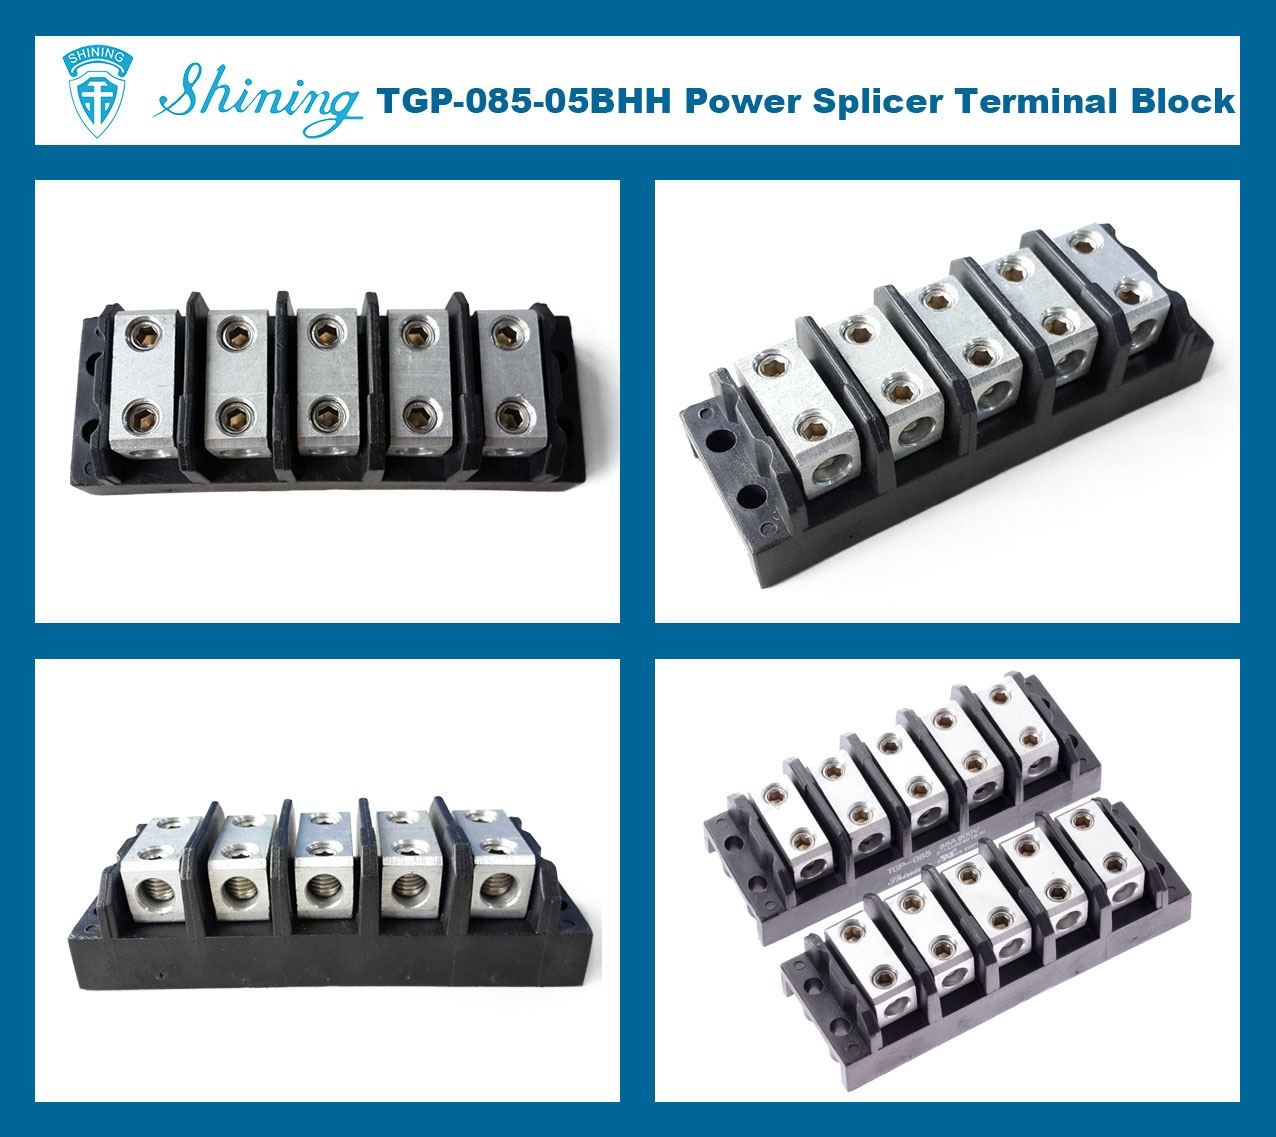 TGP-085-05BHH 600V 85A 5 Way Power Splicer Terminal Block